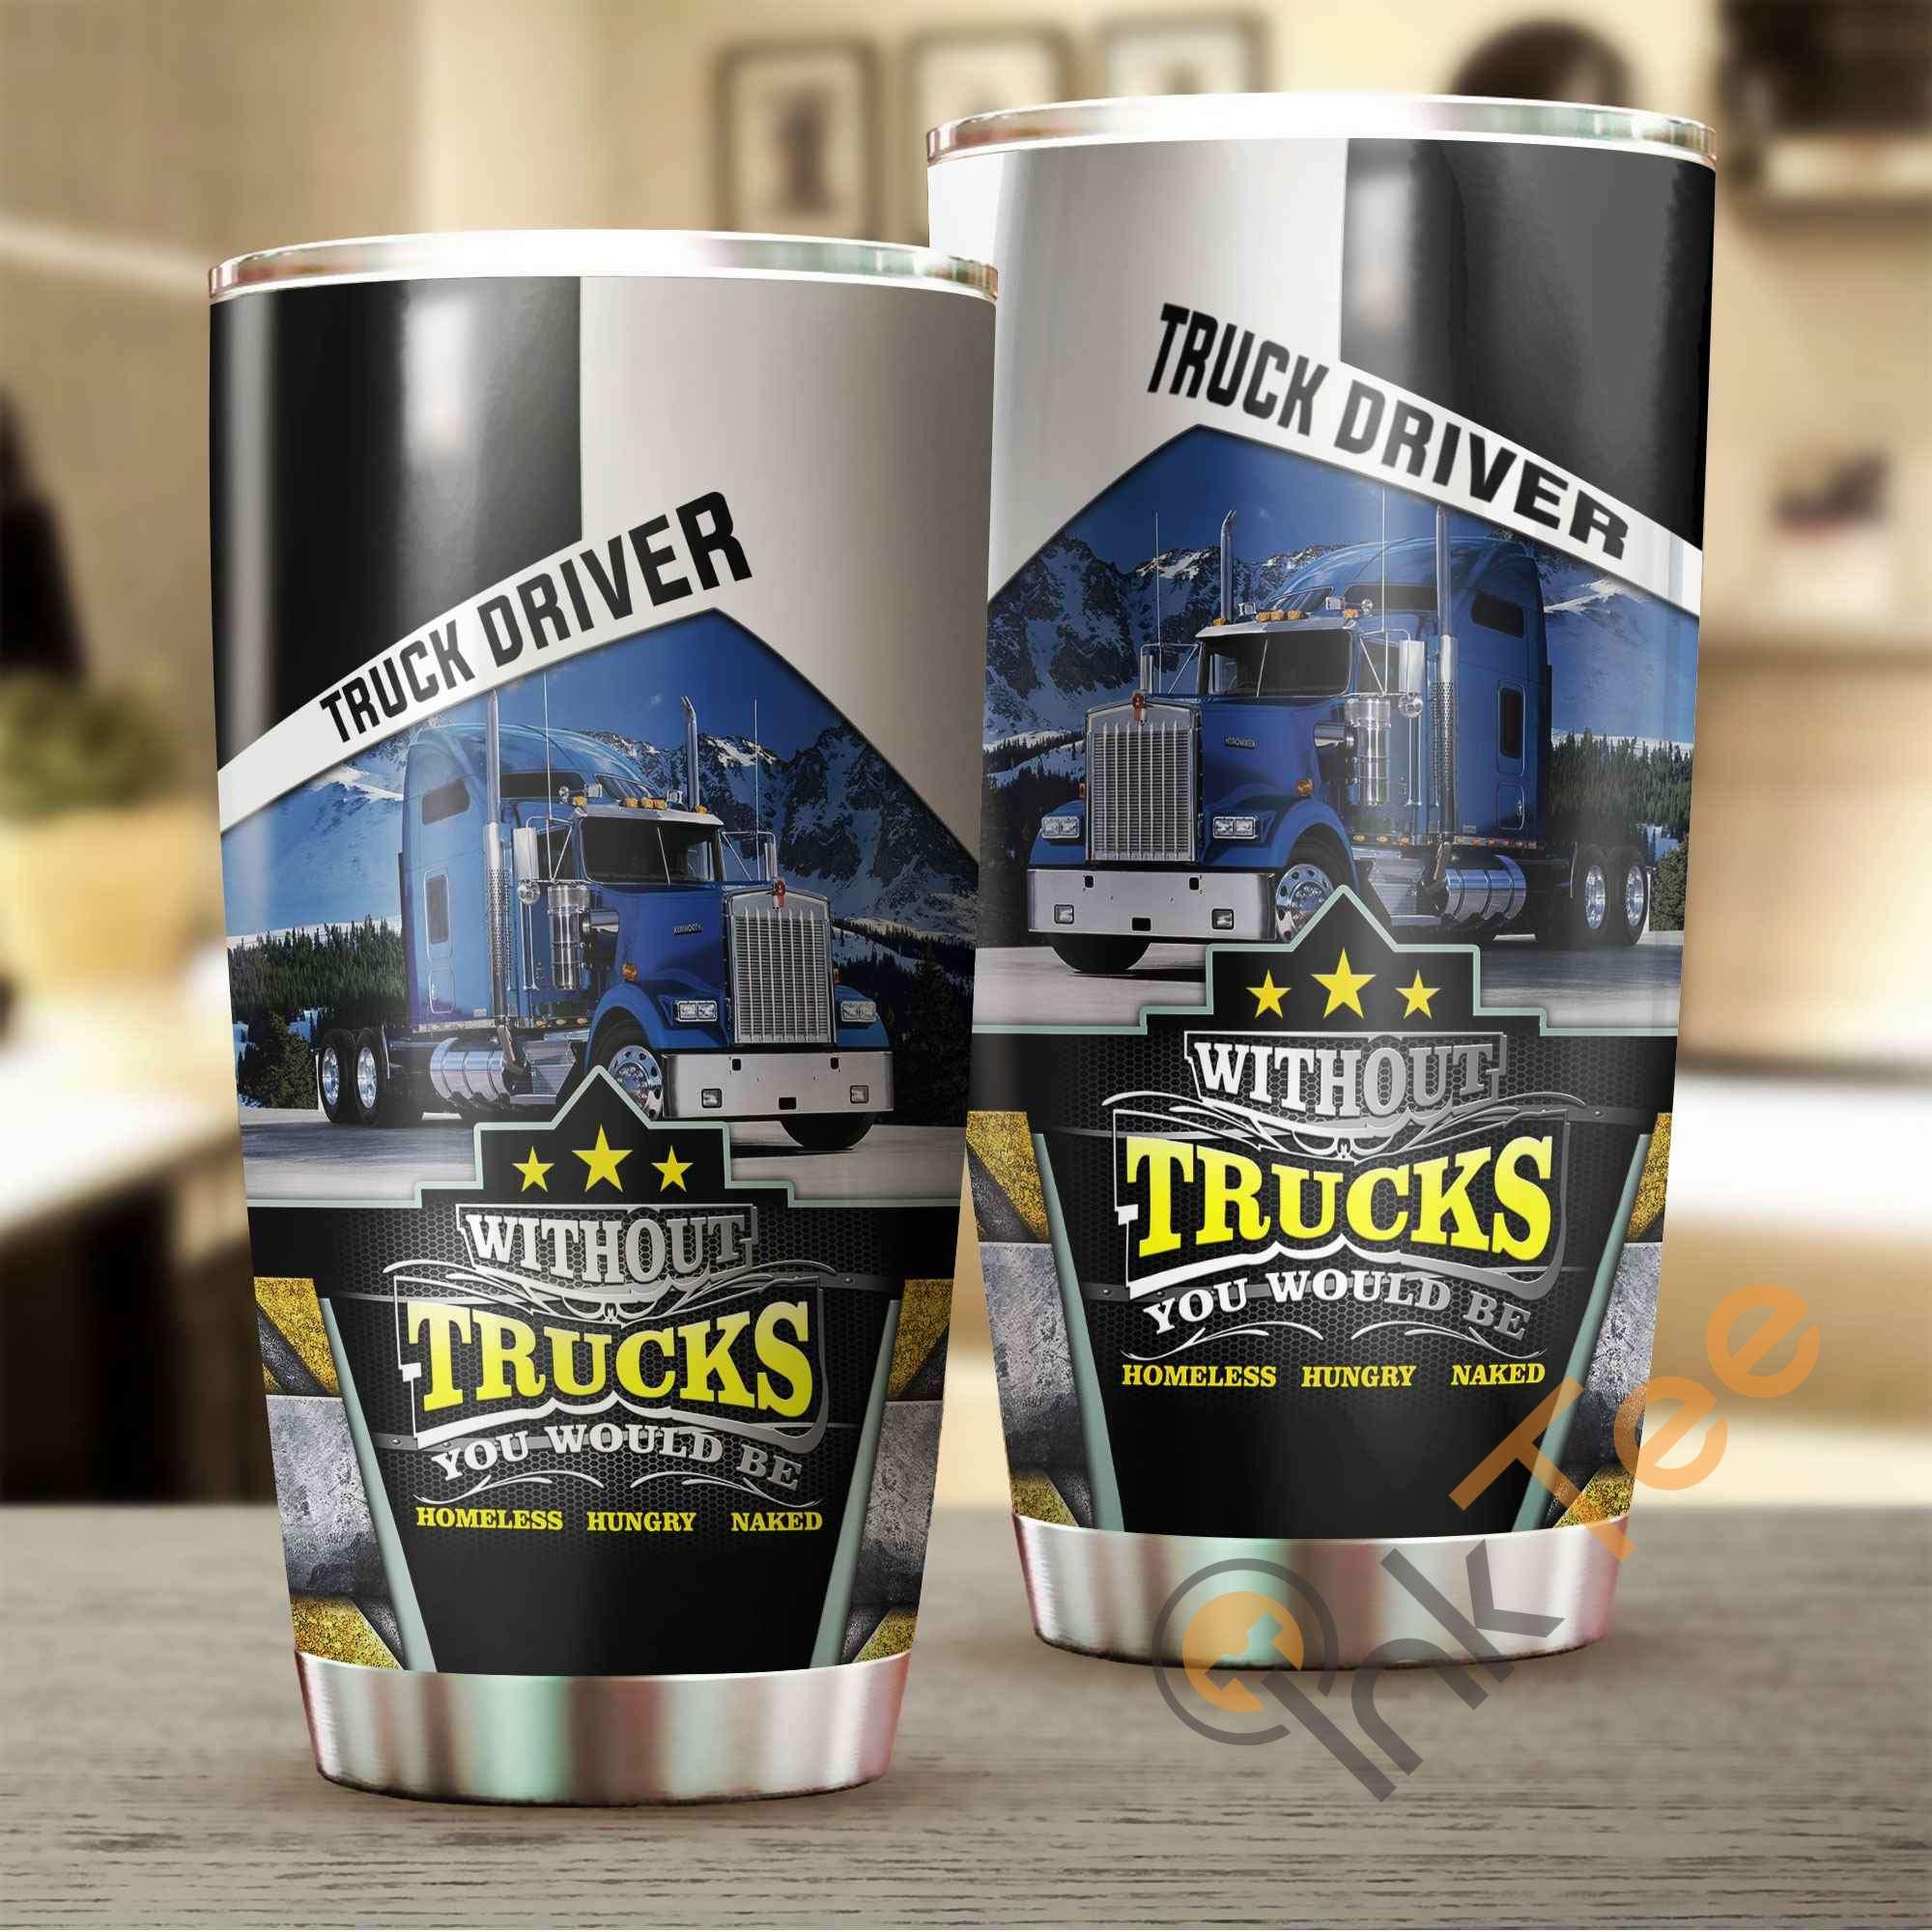 Beautiful Truck Amazon Best Seller Sku 2983 Stainless Steel Tumbler